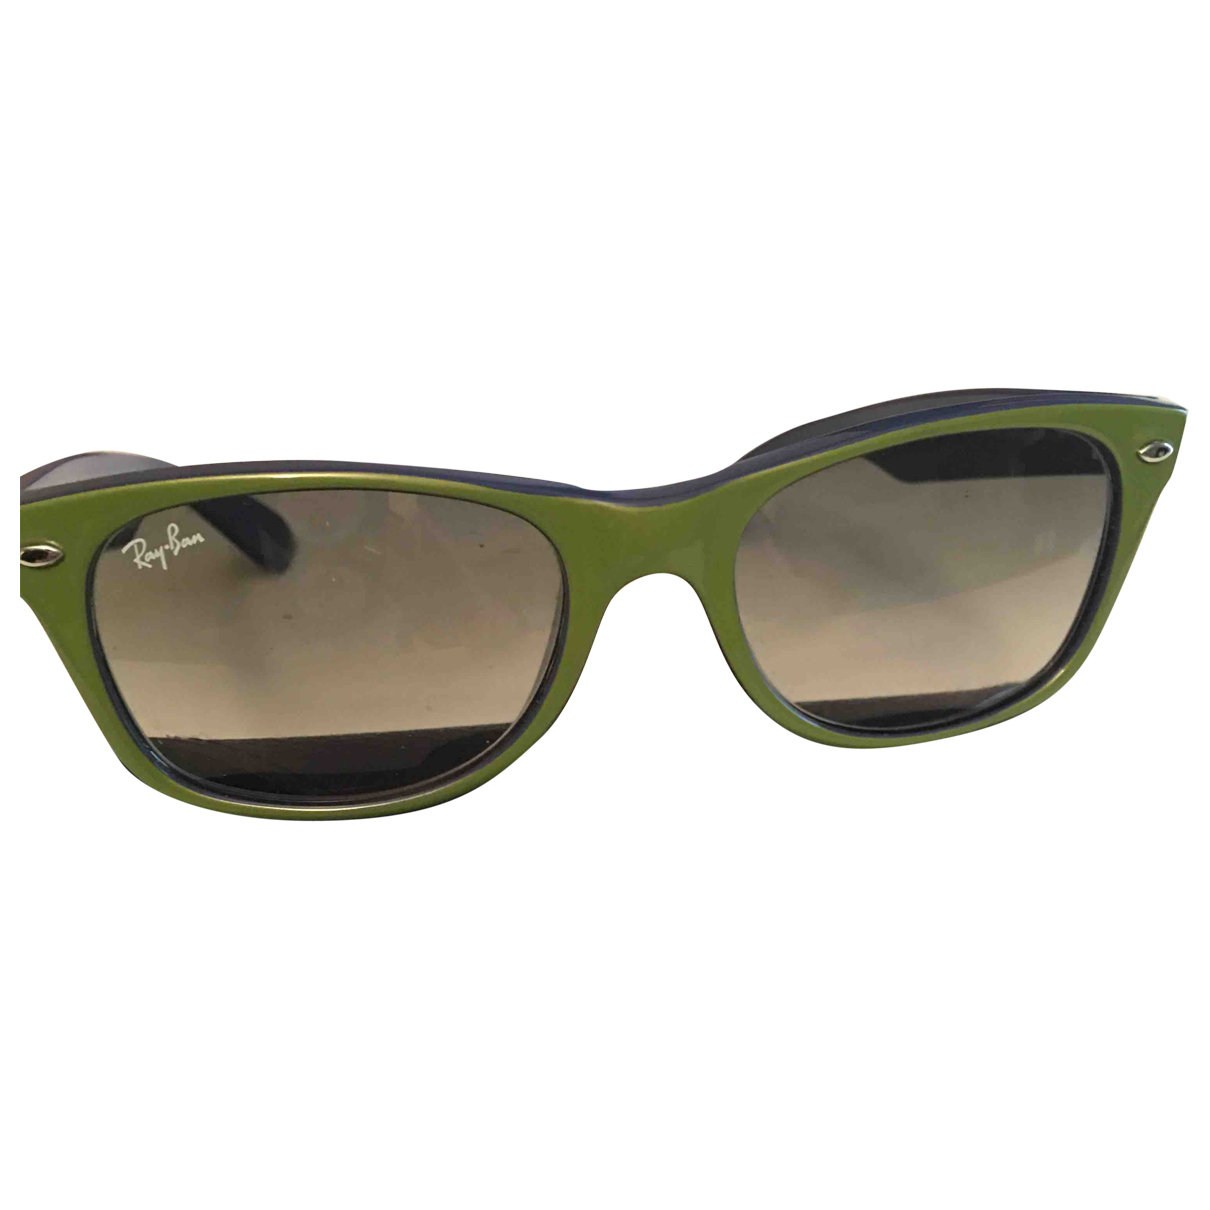 Ray-ban - Lunettes Original Wayfarer pour femme - vert